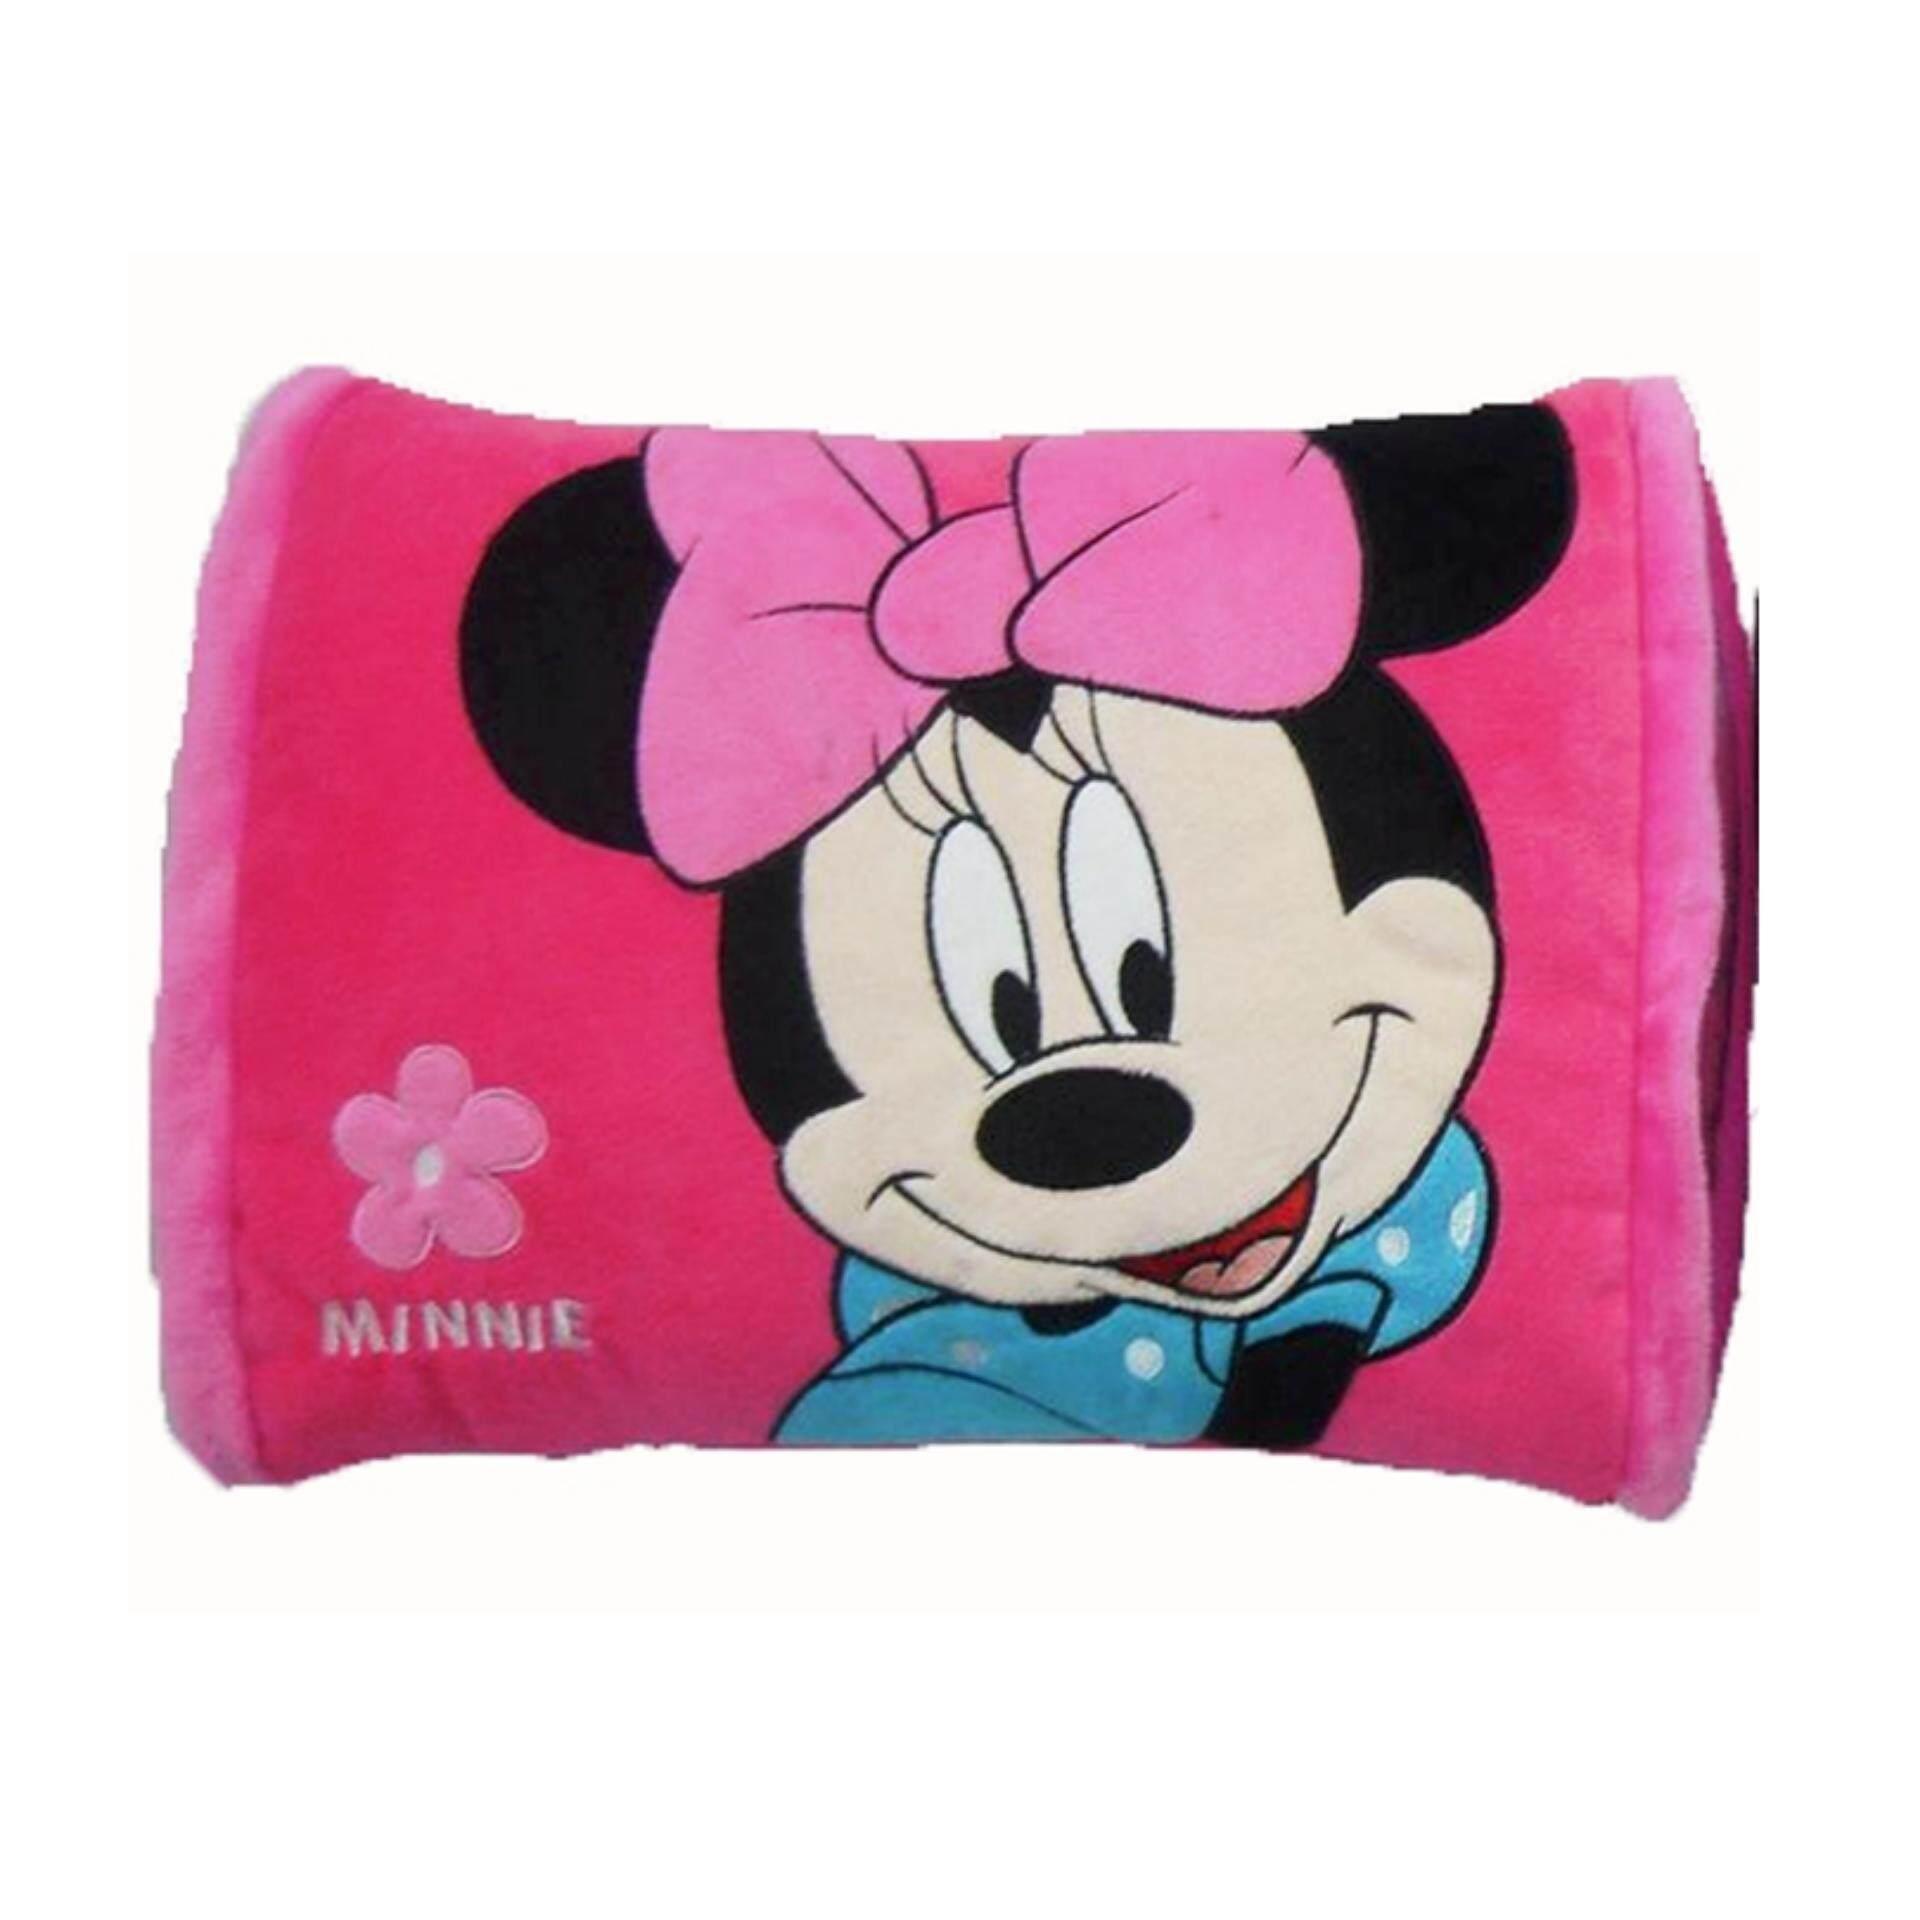 Disney Minnie Rectangular Cushion - Violet Blue Minnie